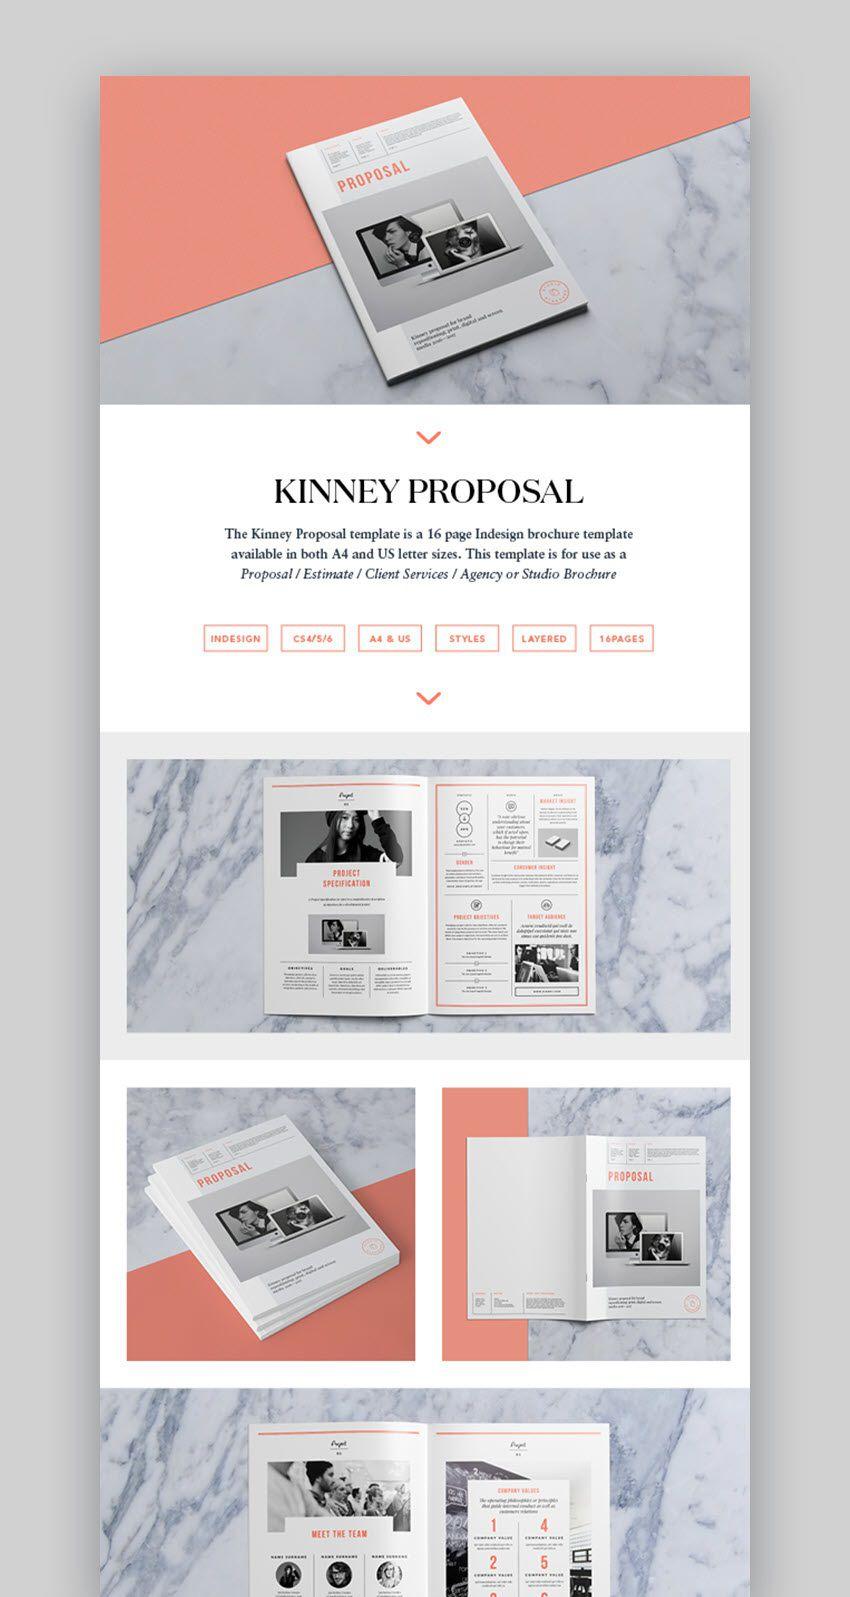 006 Fascinating Graphic Design Proposal Template Free High Resolution  Freelance Pdf IndesignFull